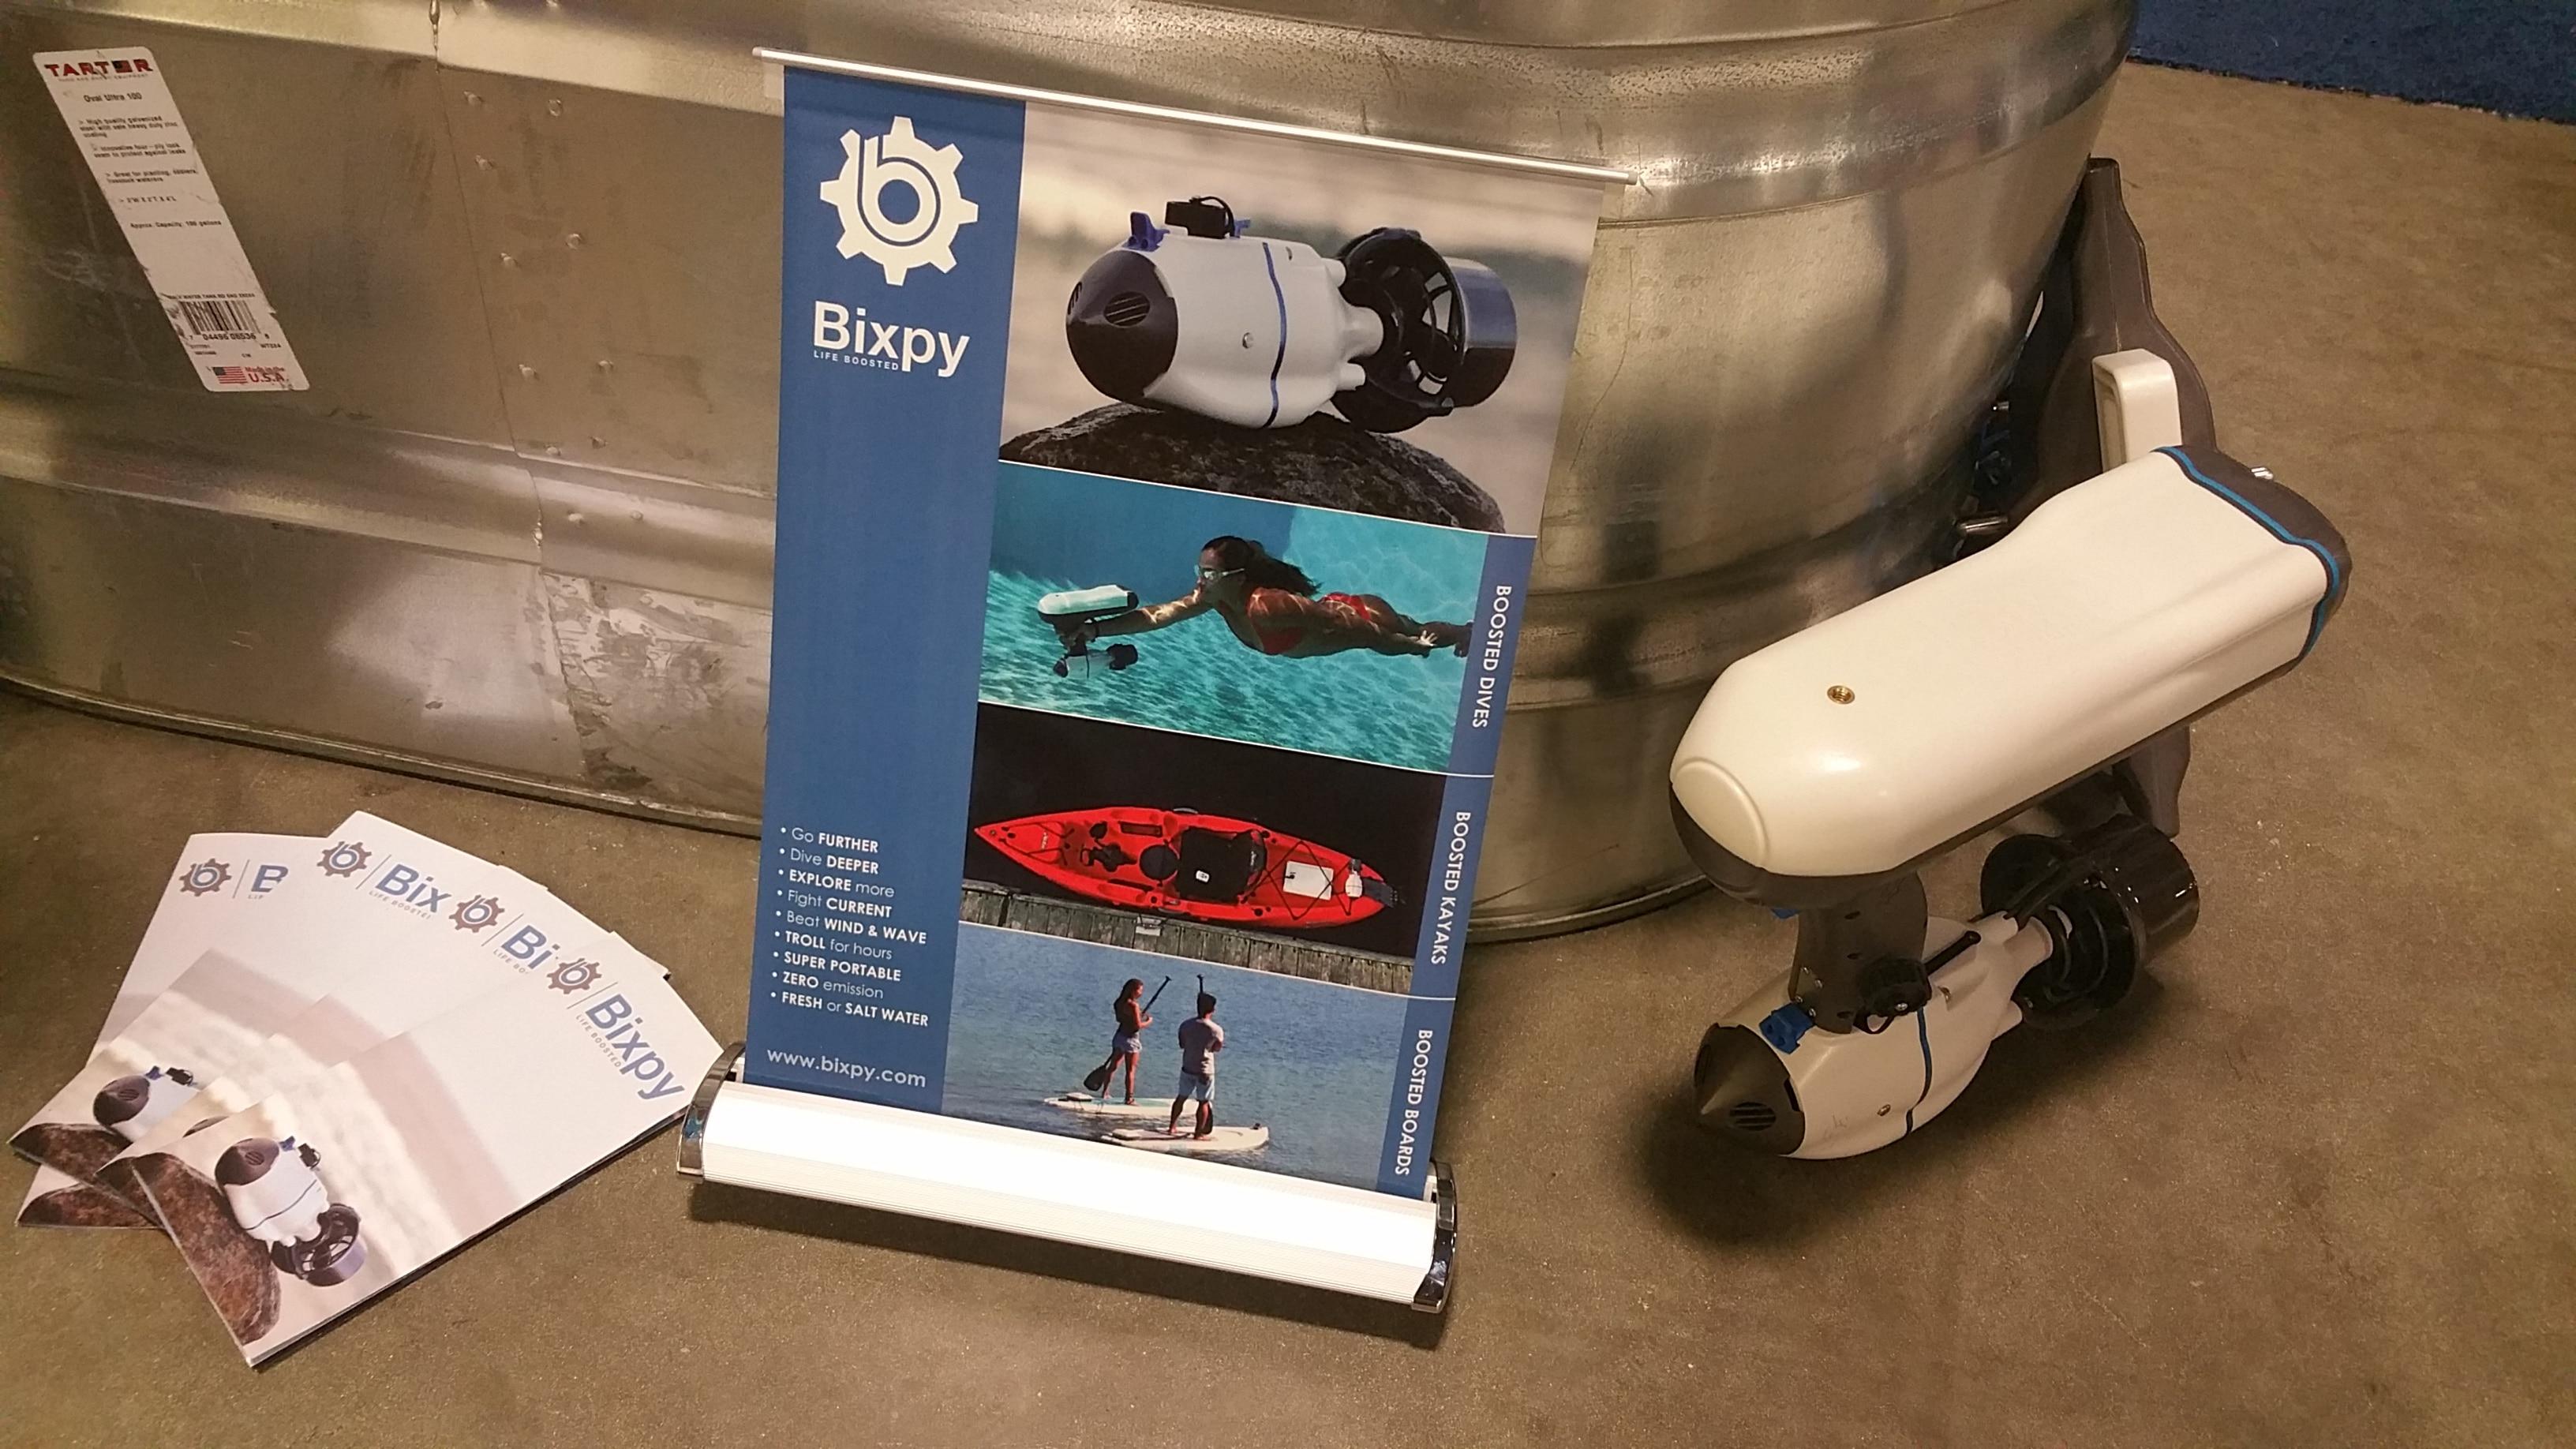 Bixby Swim Jet at Blue Wild 2018